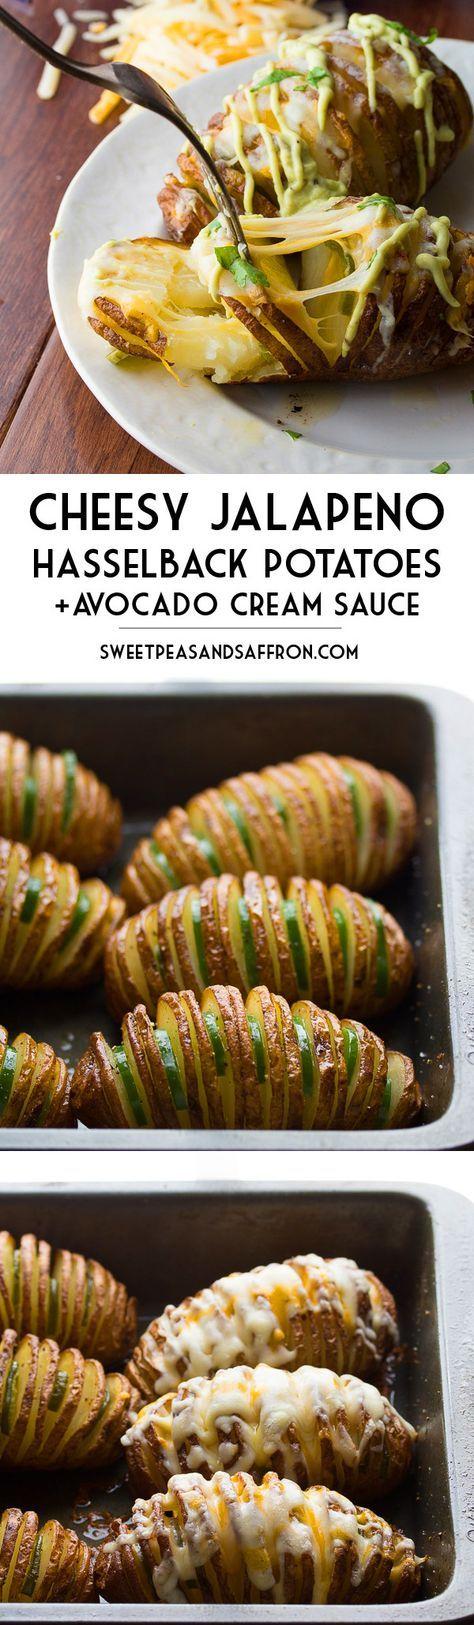 Cheesy Jalapeño Hasselback Potatoes with Avocado Cream Sauce | sweetpeasandsaffron.com @sweetpeasaffron